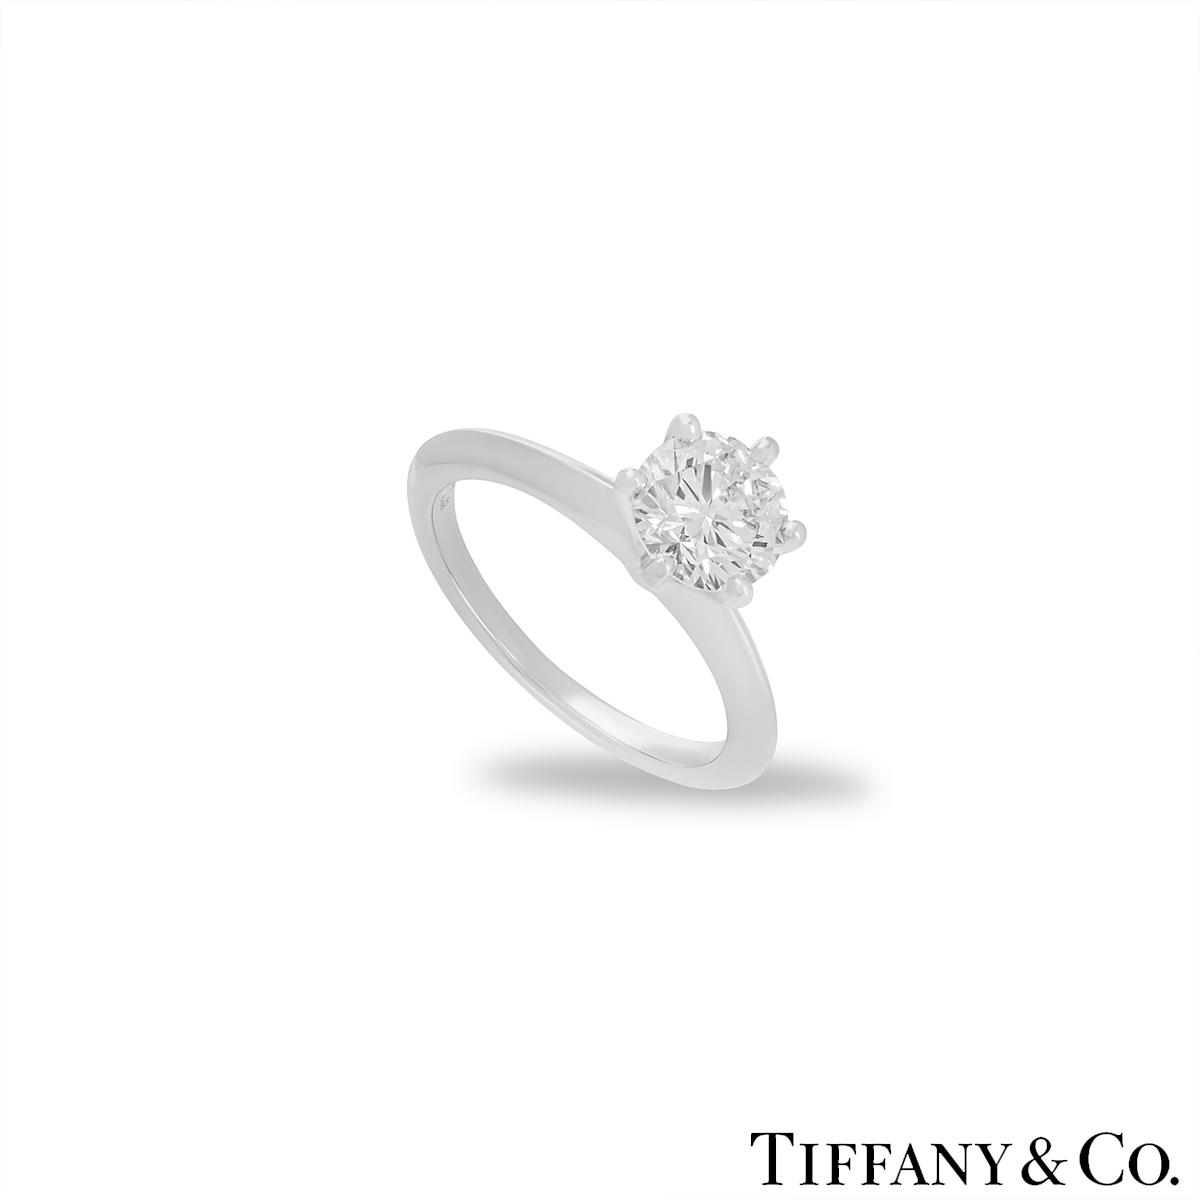 Tiffany & Co. Platinum Diamond Setting Ring 1.08ct I/VS1 XXX